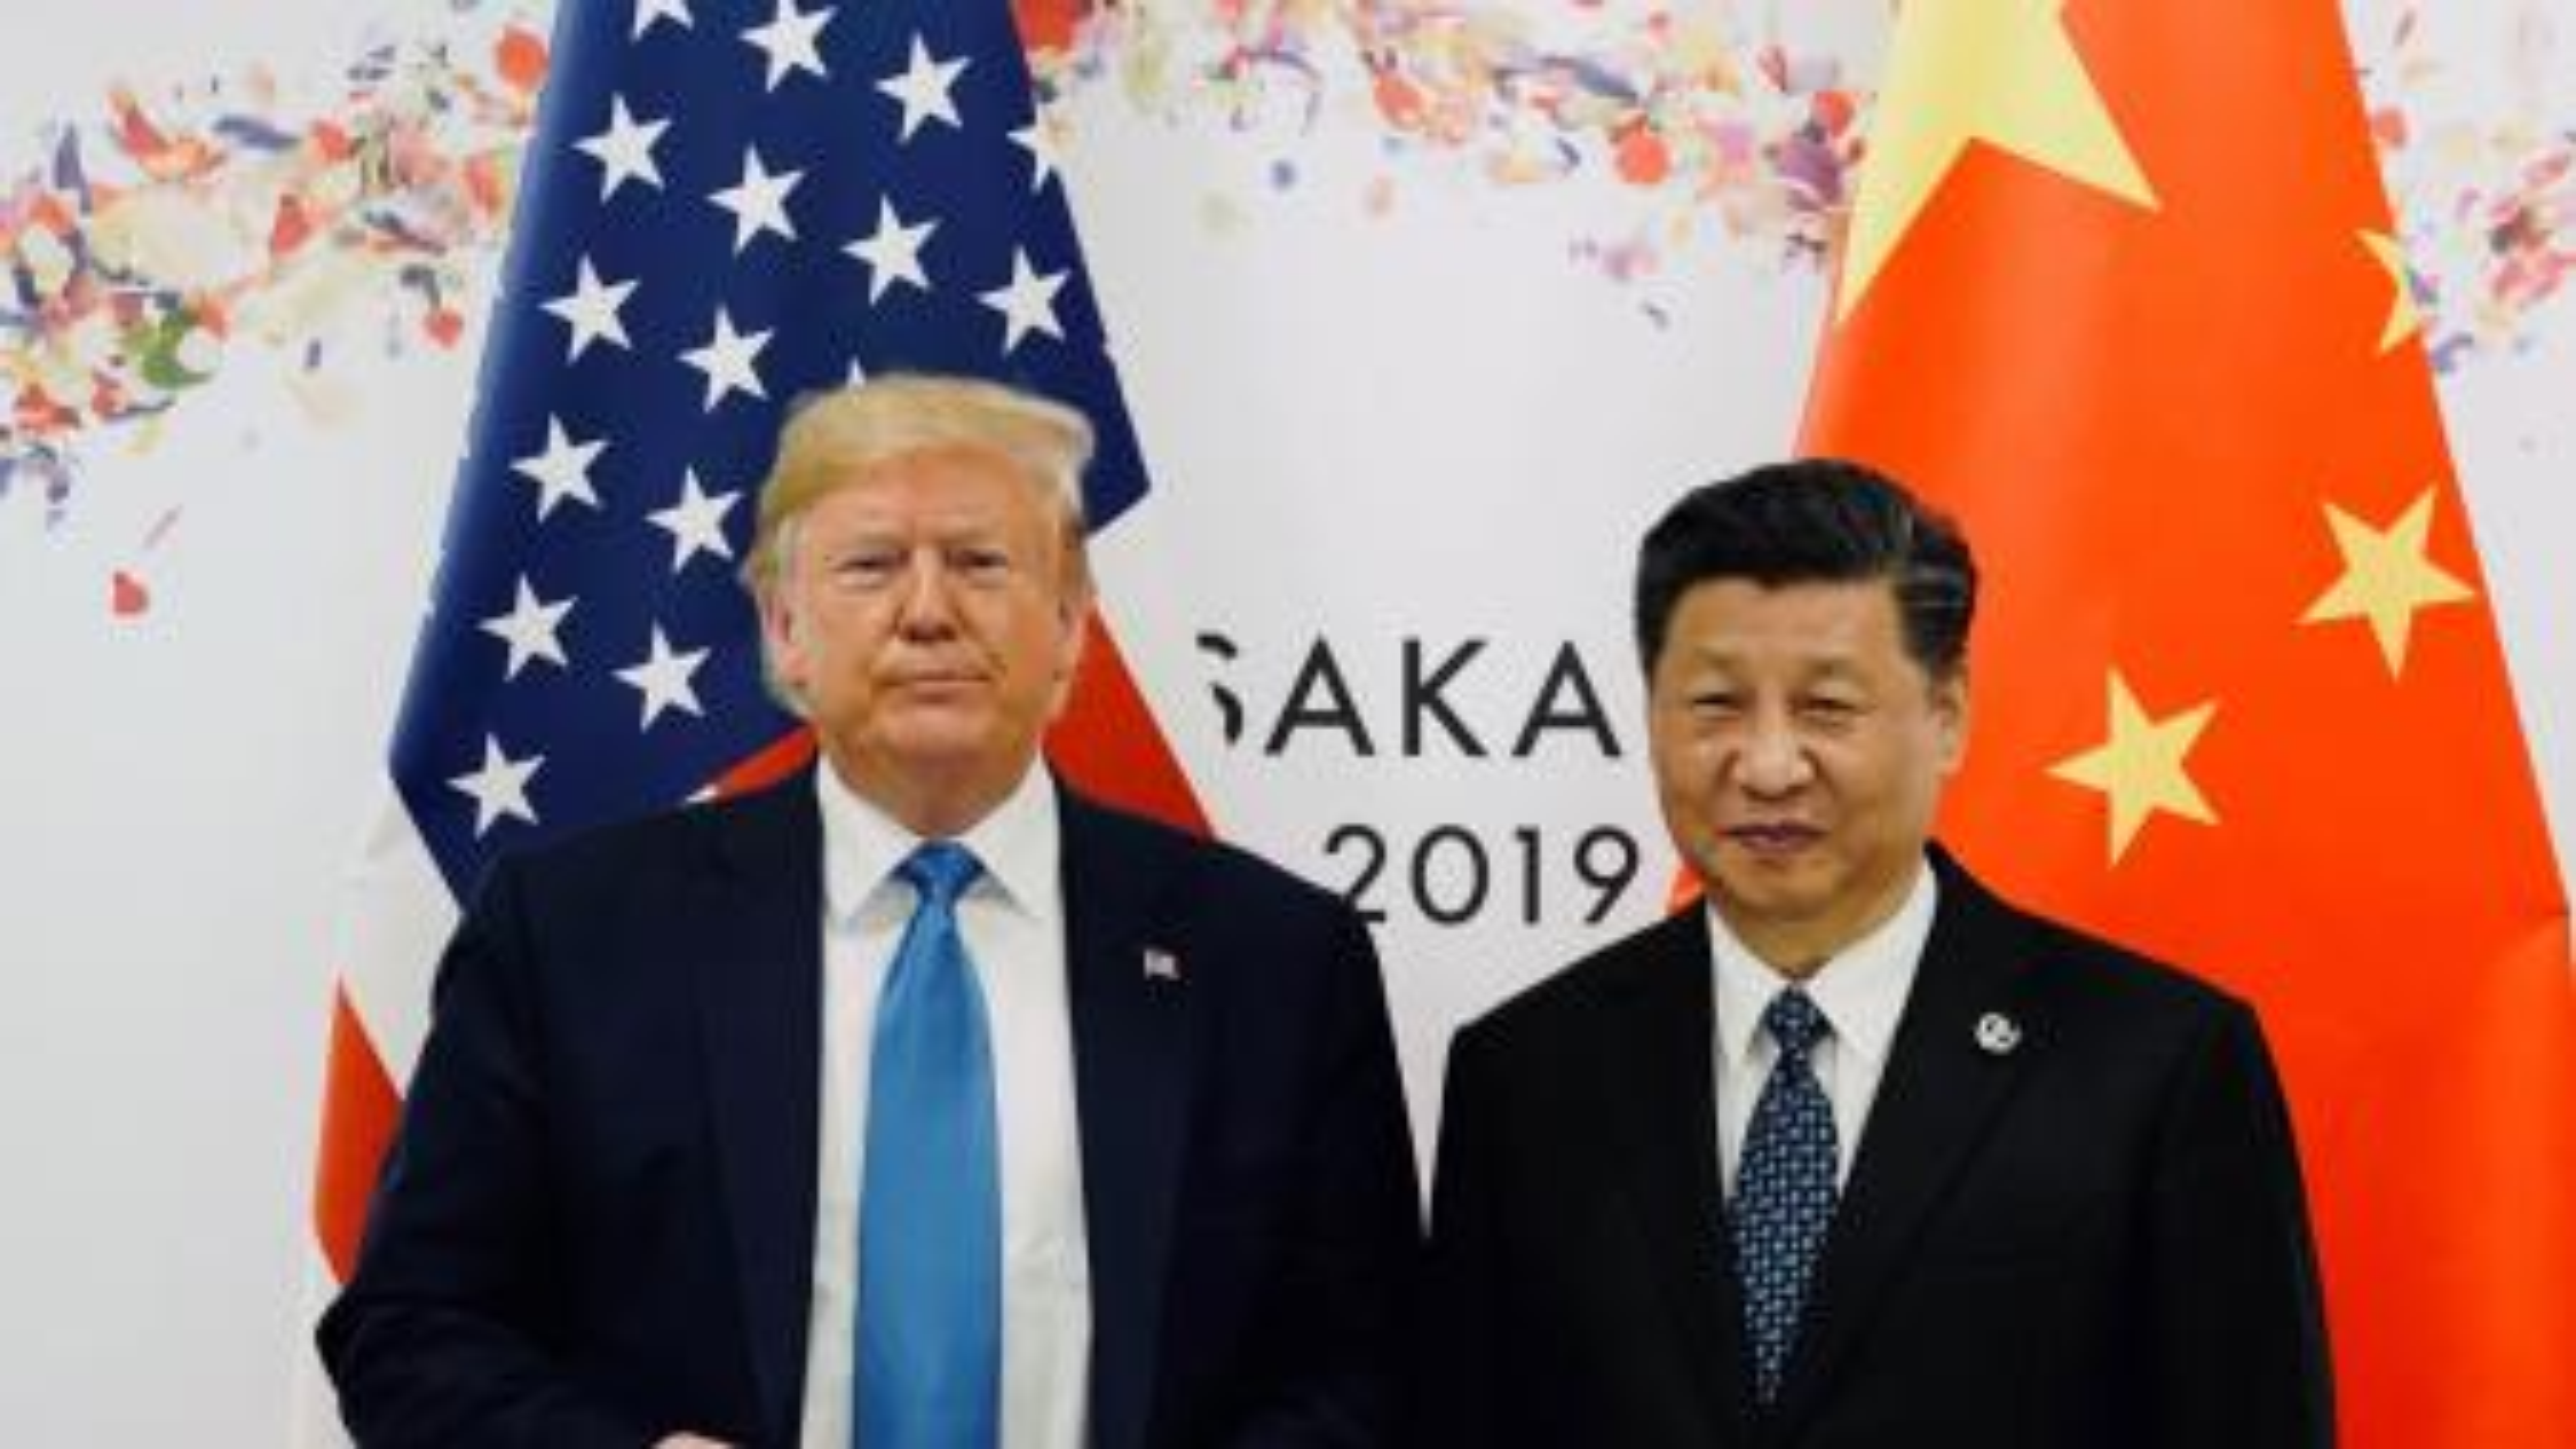 US president Donald Trump standing alongside Chinese president Xi Jinping.